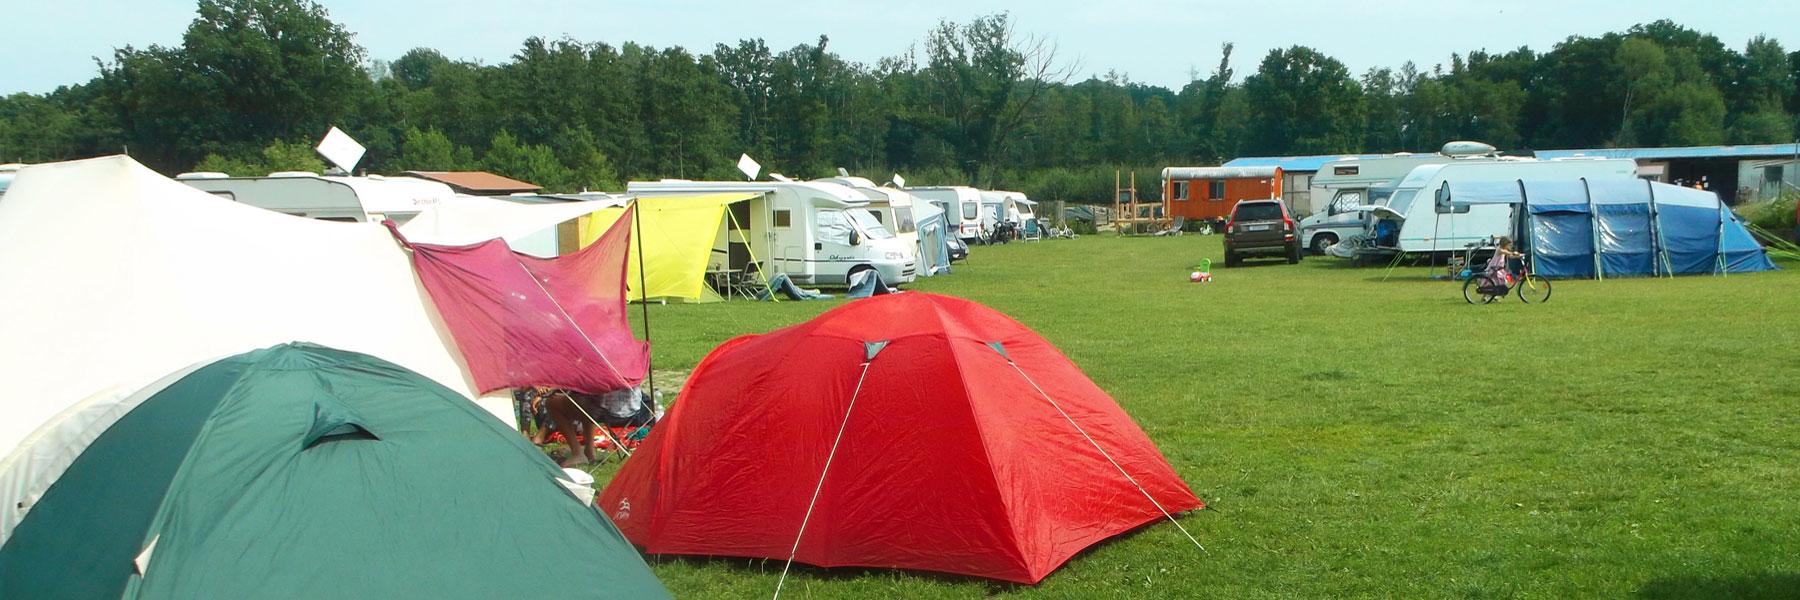 Zeltplatz - Camping Sabines Bauernhof